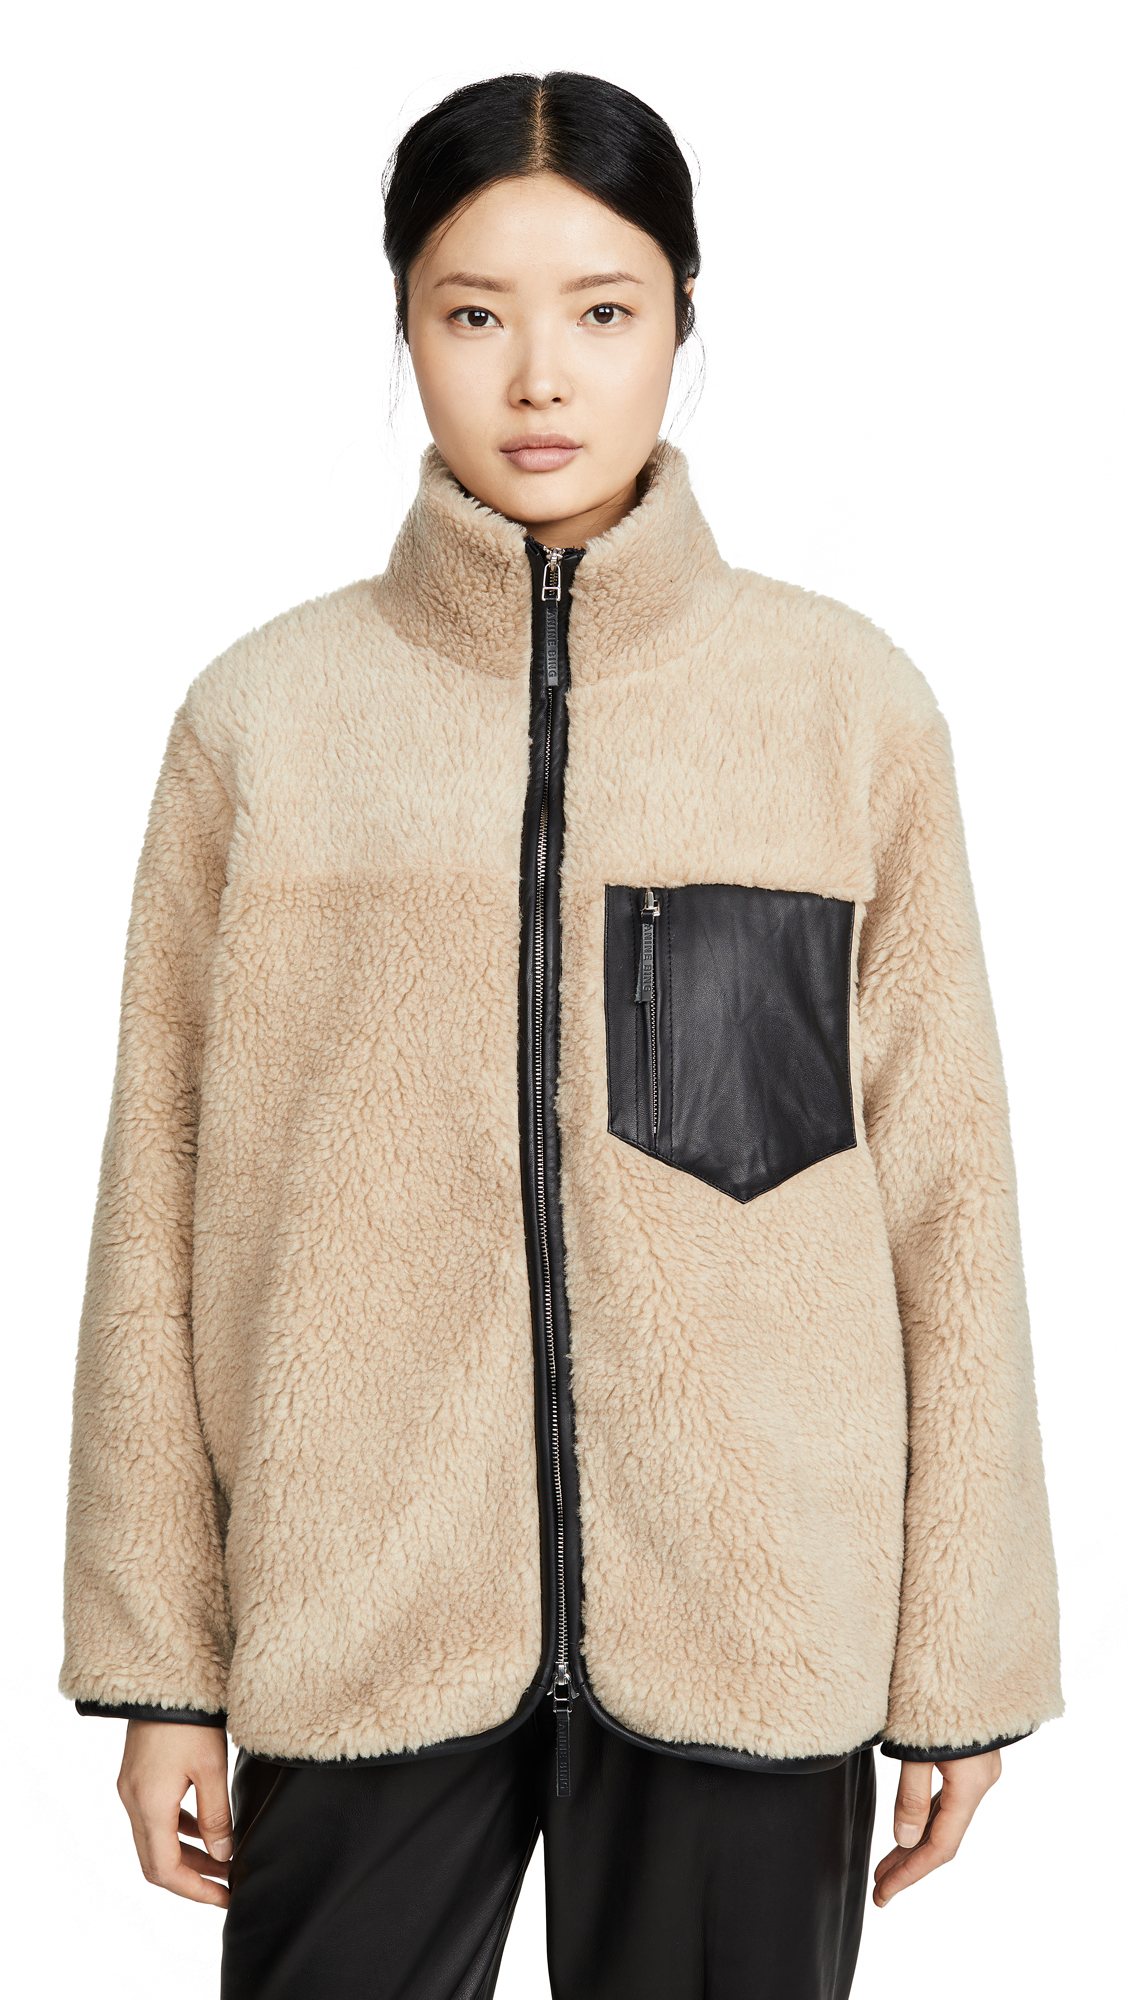 Buy ANINE BING Ryder Jacket online beautiful ANINE BING Jackets, Coats, Coats